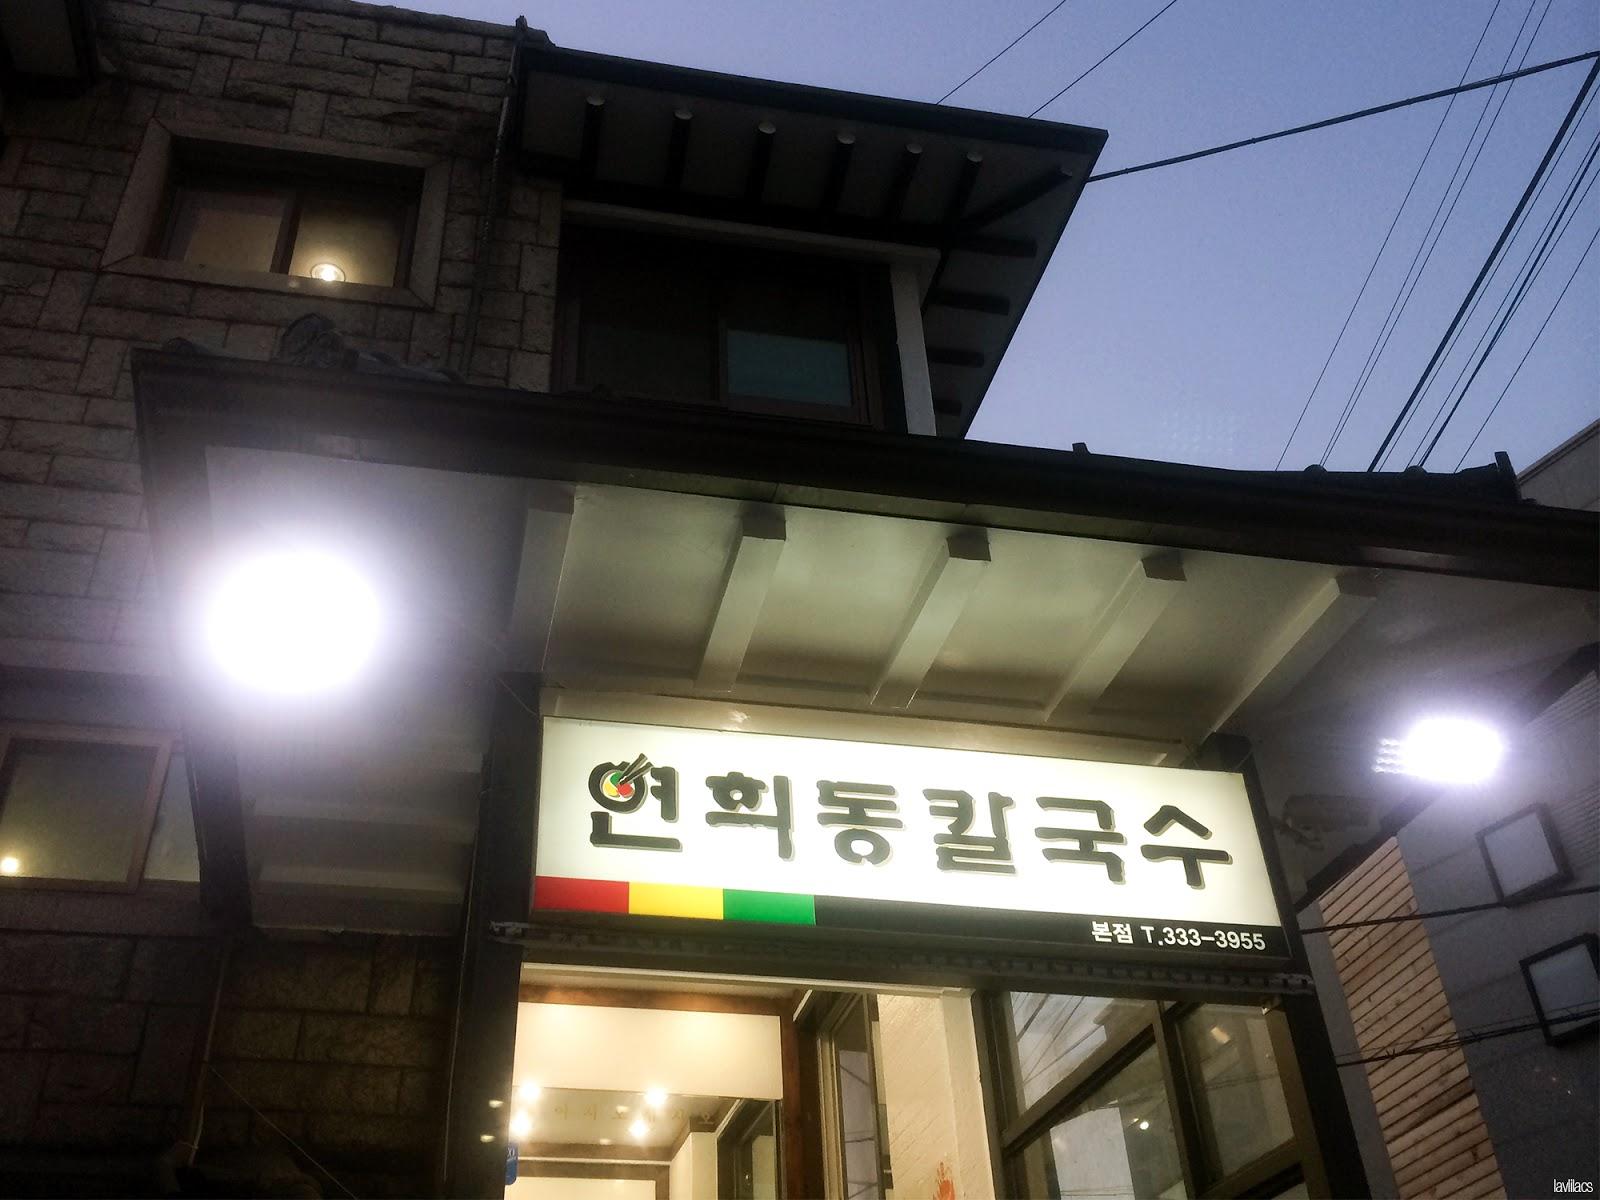 Seoul, Korea - Summer Study Abroad 2014 - Yeonhuidong Kalgooksoo store front